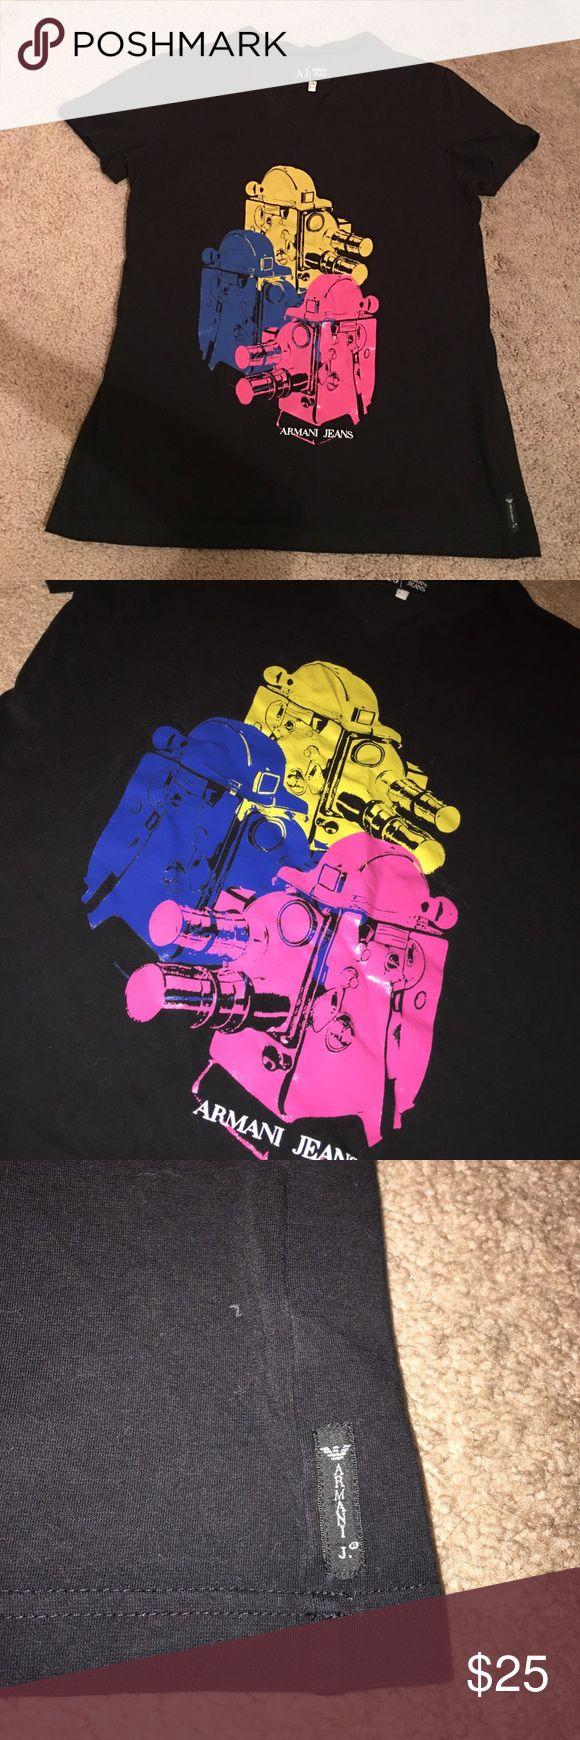 Men's Armani Jeans V Neck T Shirt Like new. No flaws. USA L, EU X-Large 95% cotton, 5% Elastane. Armani Jeans Shirts Tees - Short Sleeve